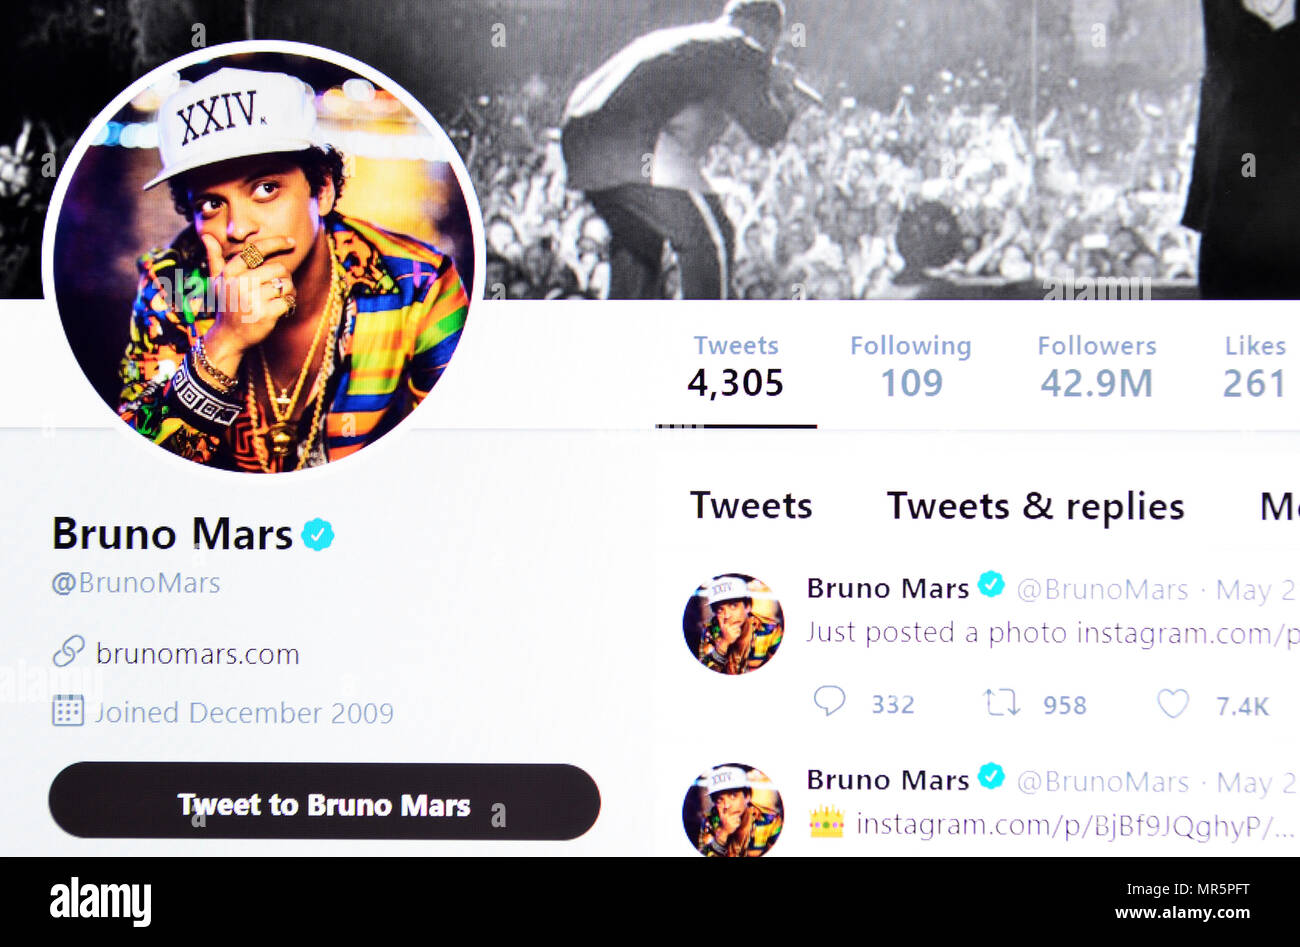 bruno mars twitter page